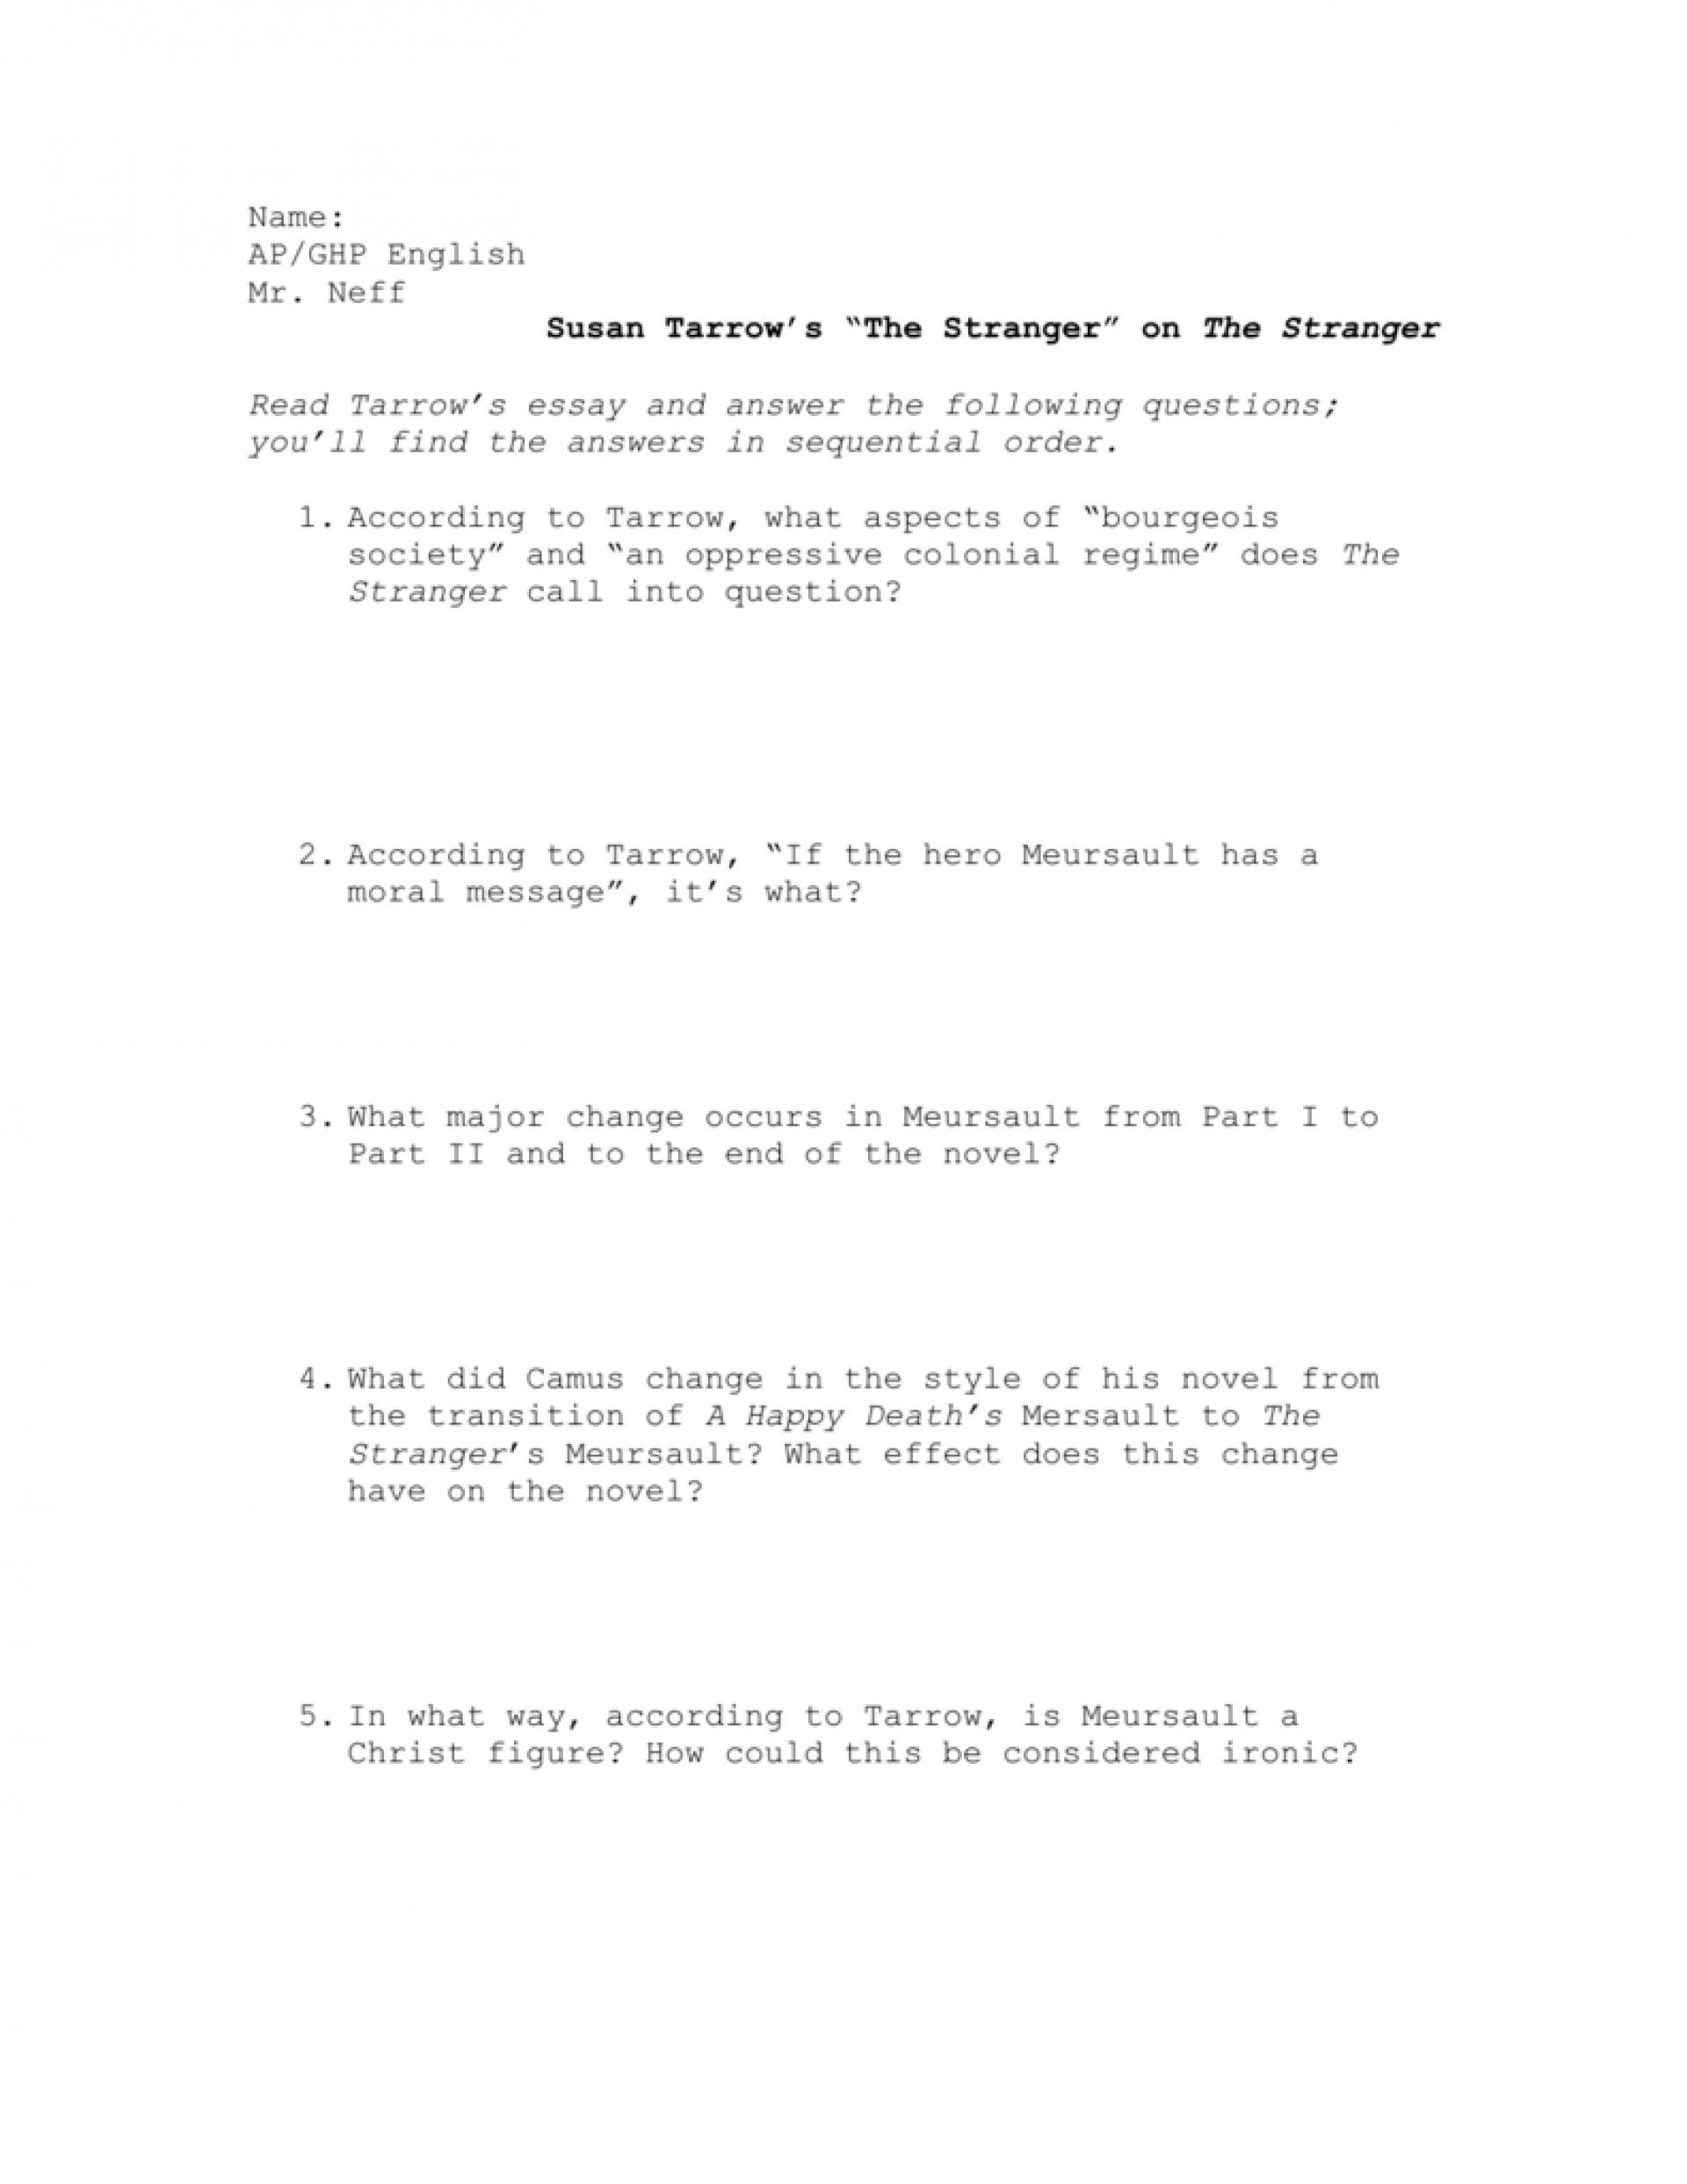 003 008589820 1 Essay Example The Unbelievable Stranger Ideas Prompts 1920